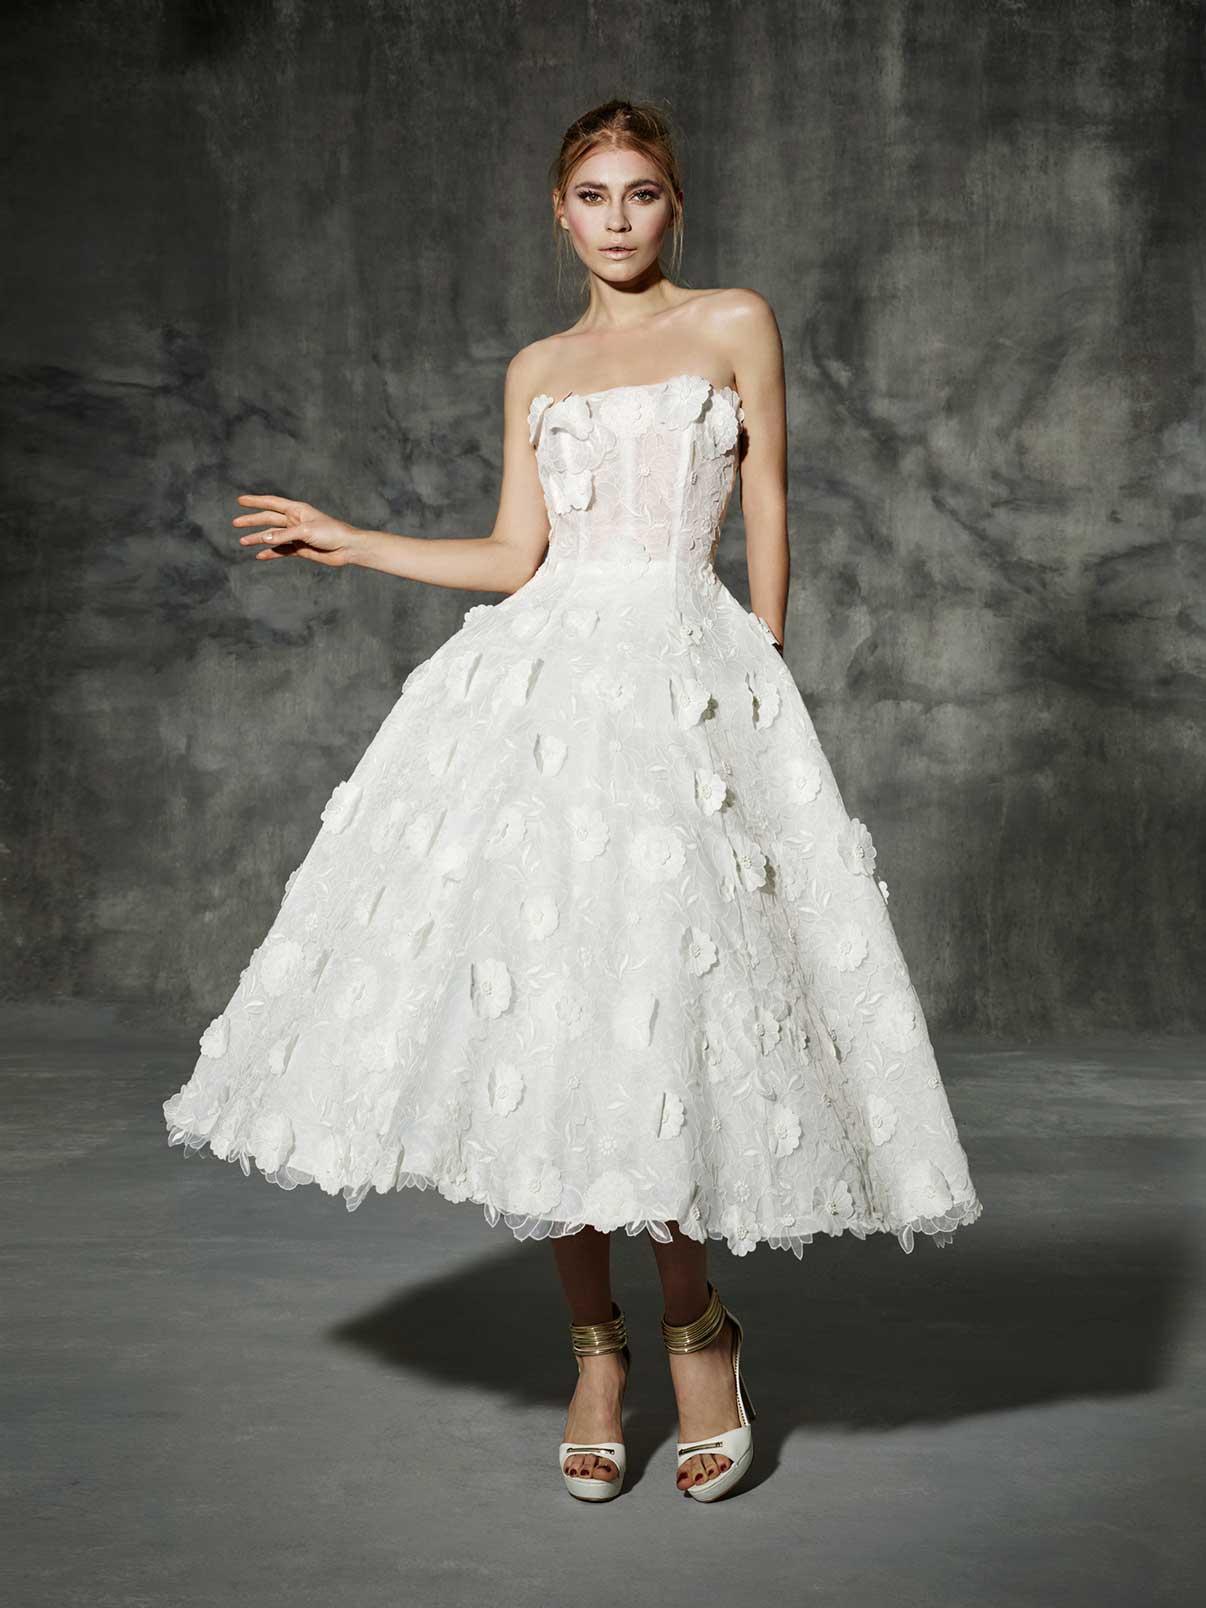 4420bceb5f88 20 Chic 1950s Inspired Wedding Dresses : Chic Vintage Brides